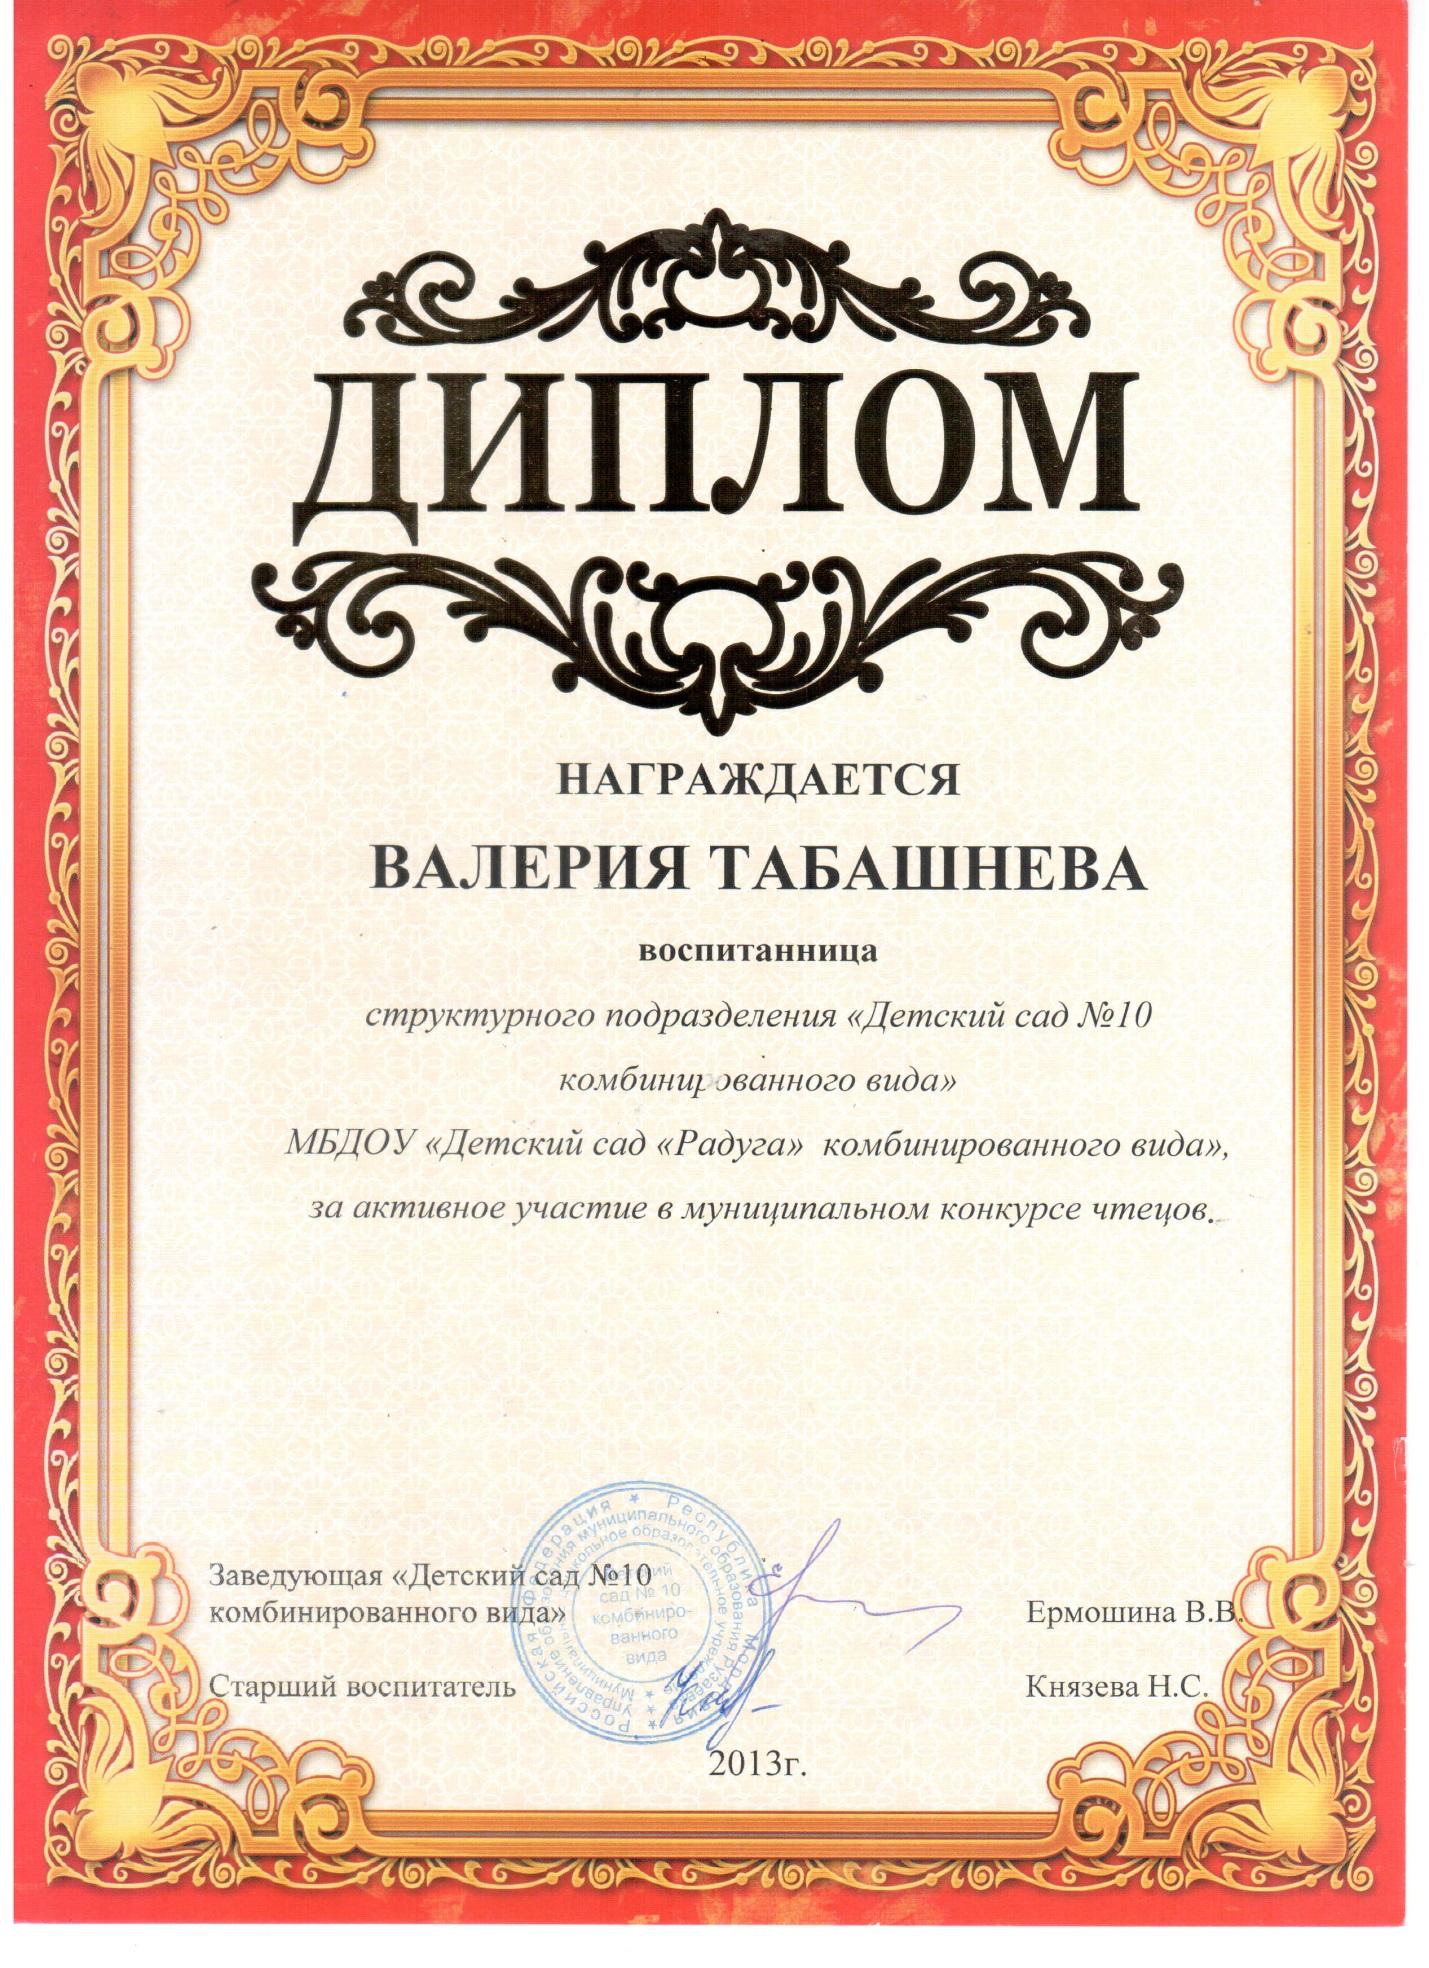 C:\Users\Гизар\Desktop\грамоты\.грамота табашнева_000.jpg